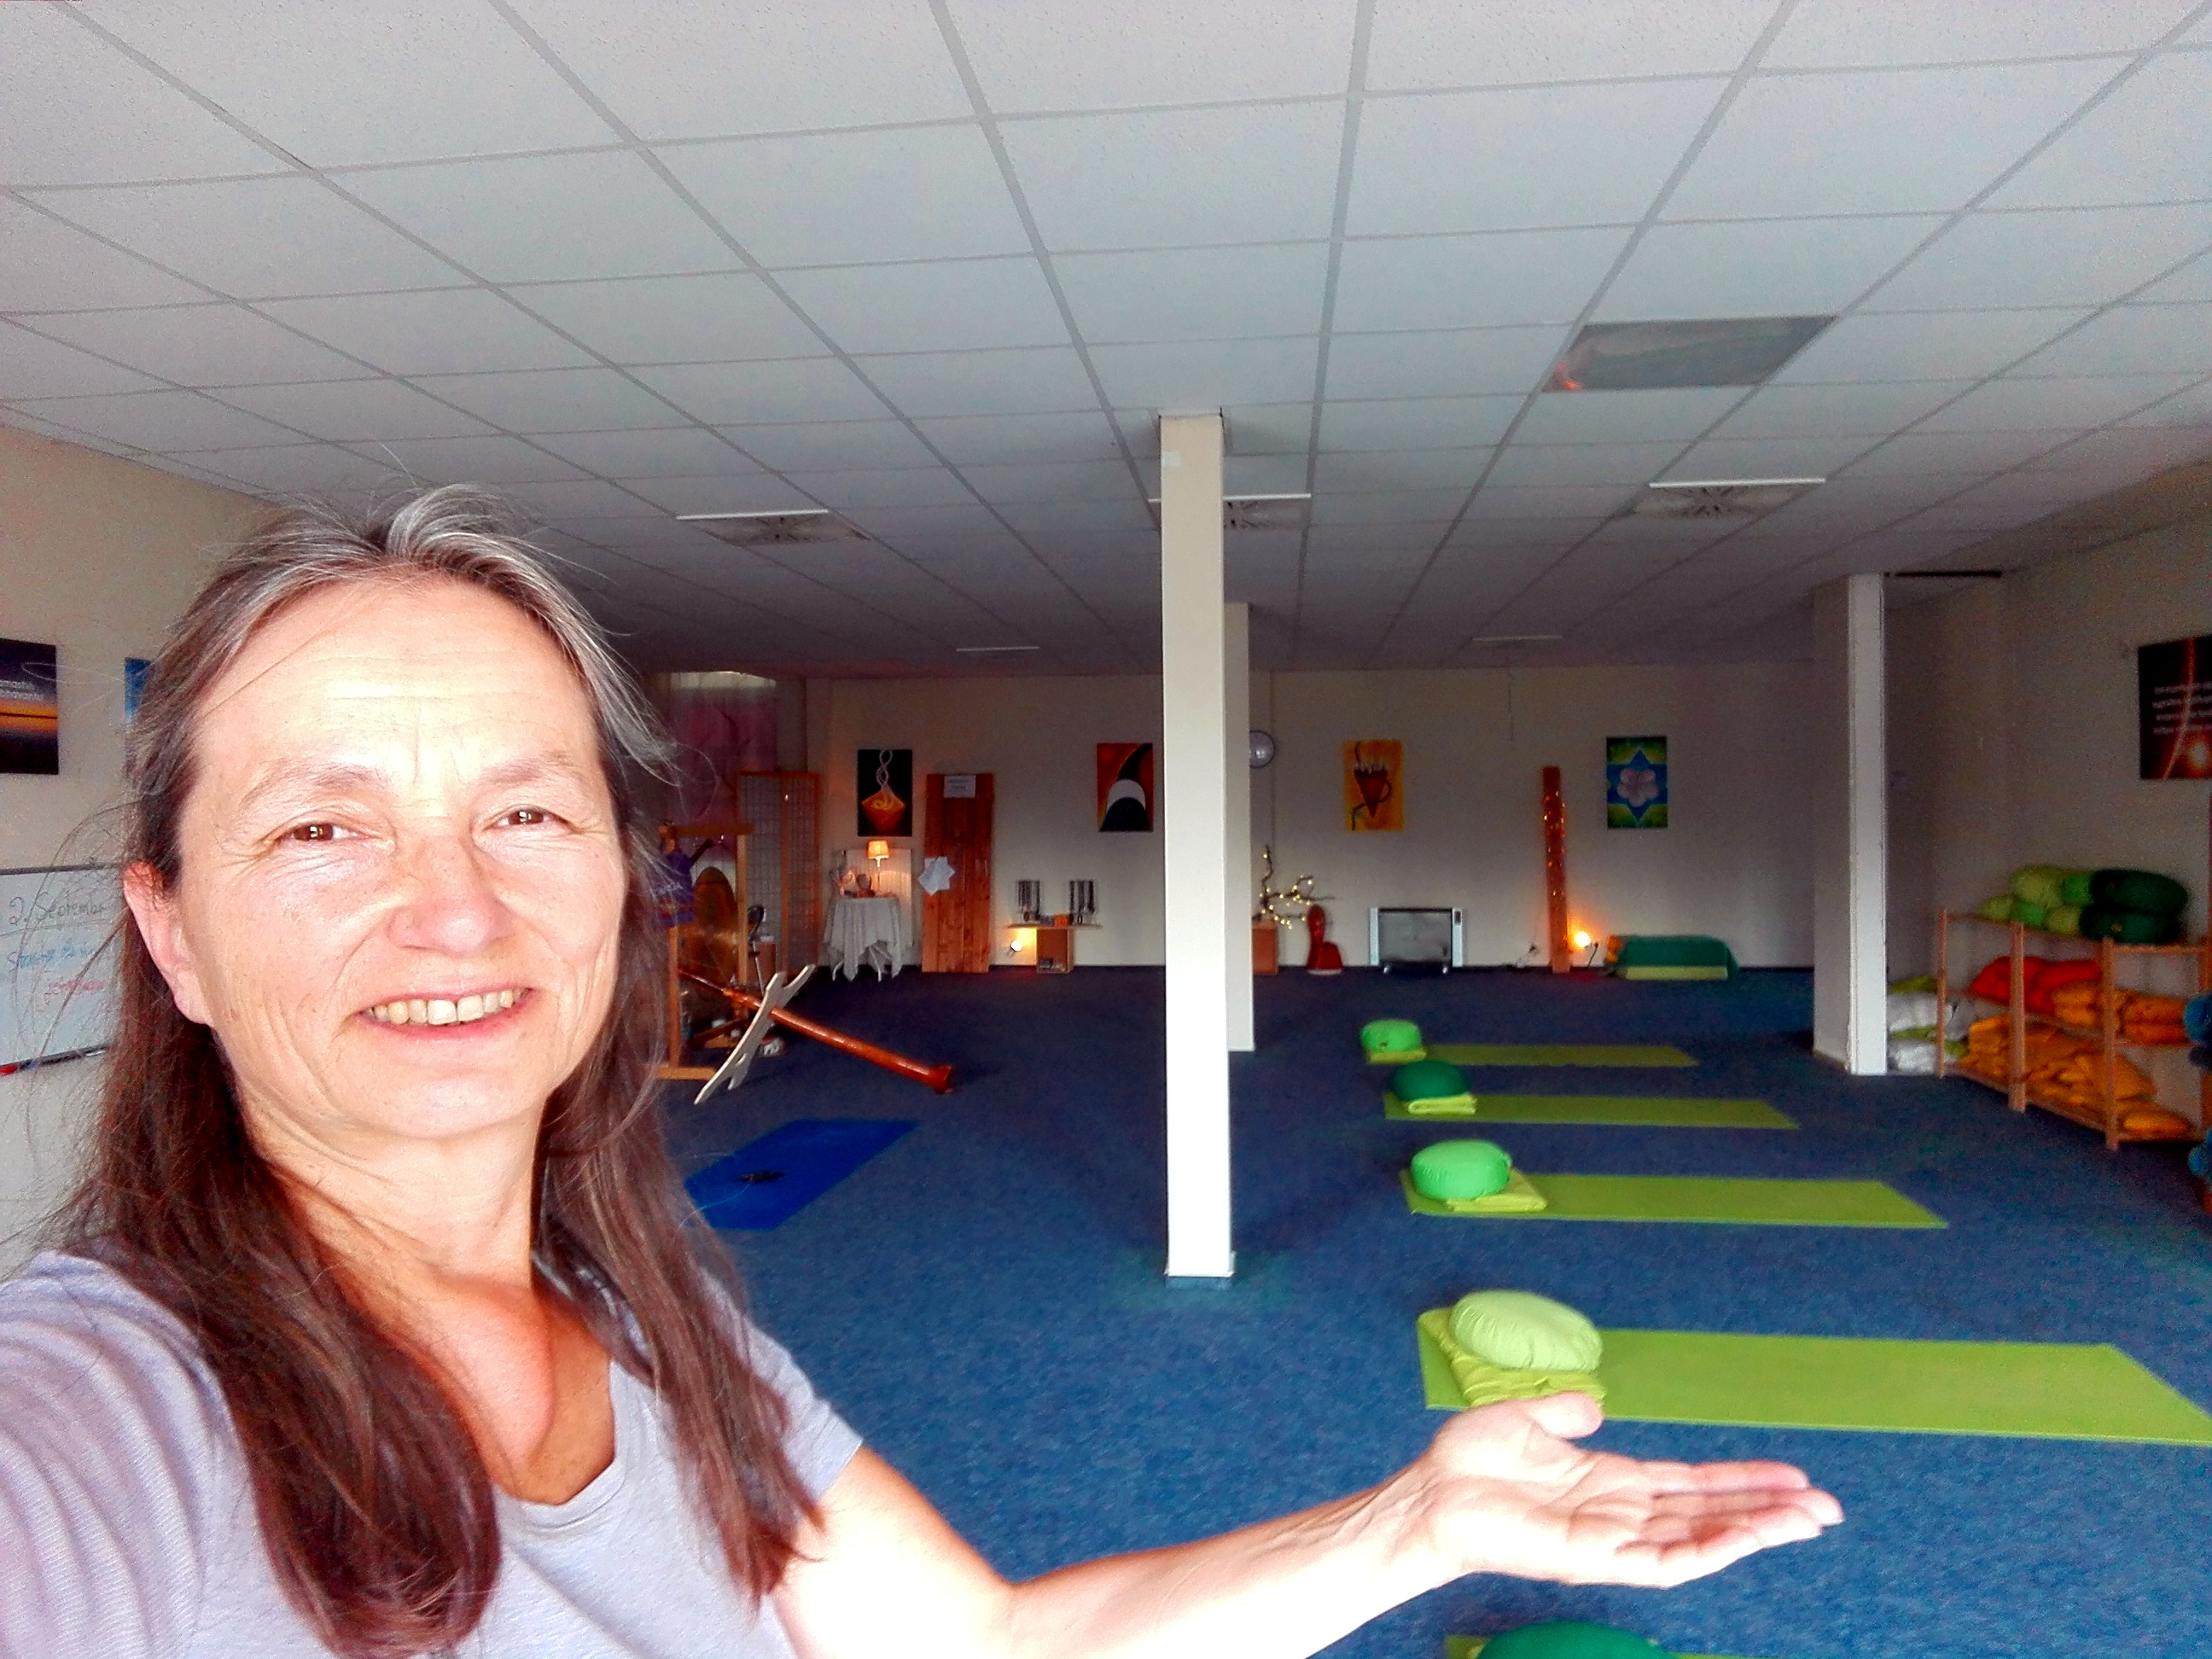 Yogaschule-Papenburg-Yoga-Raum-mit-Yogalehrerin.jpg